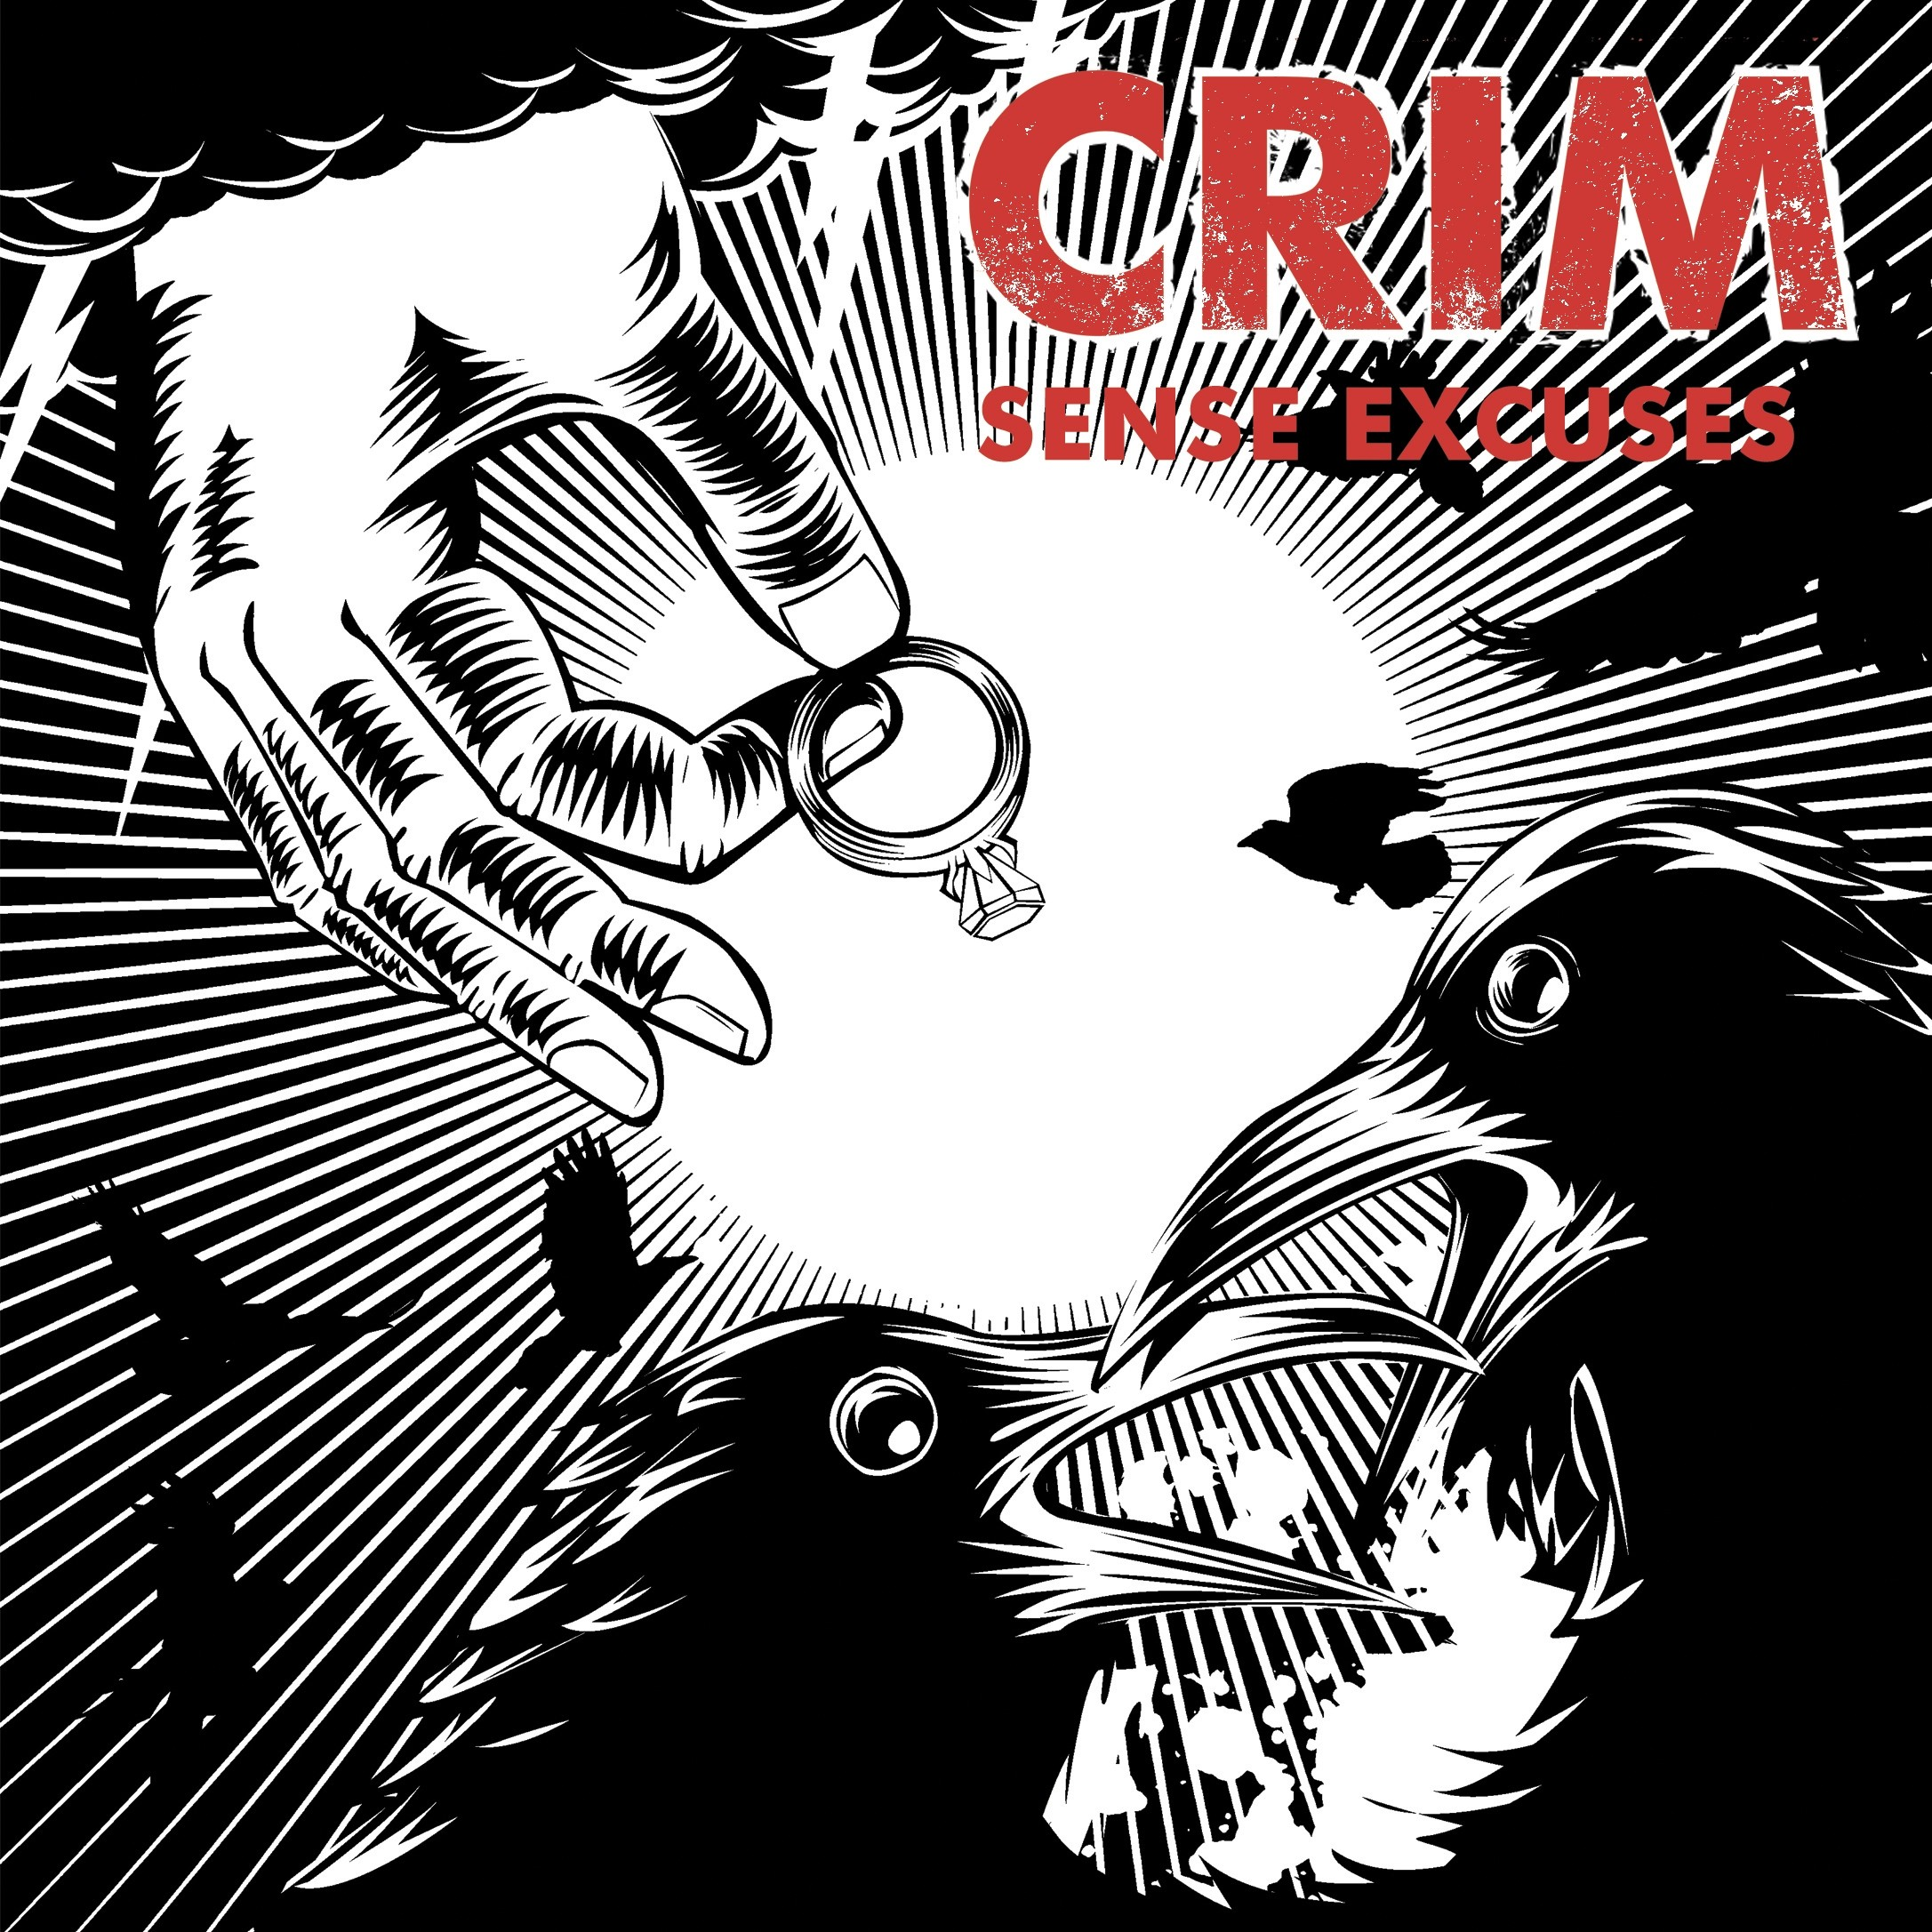 "CRIM - Sense excuses 7""EP lim. red/blk"